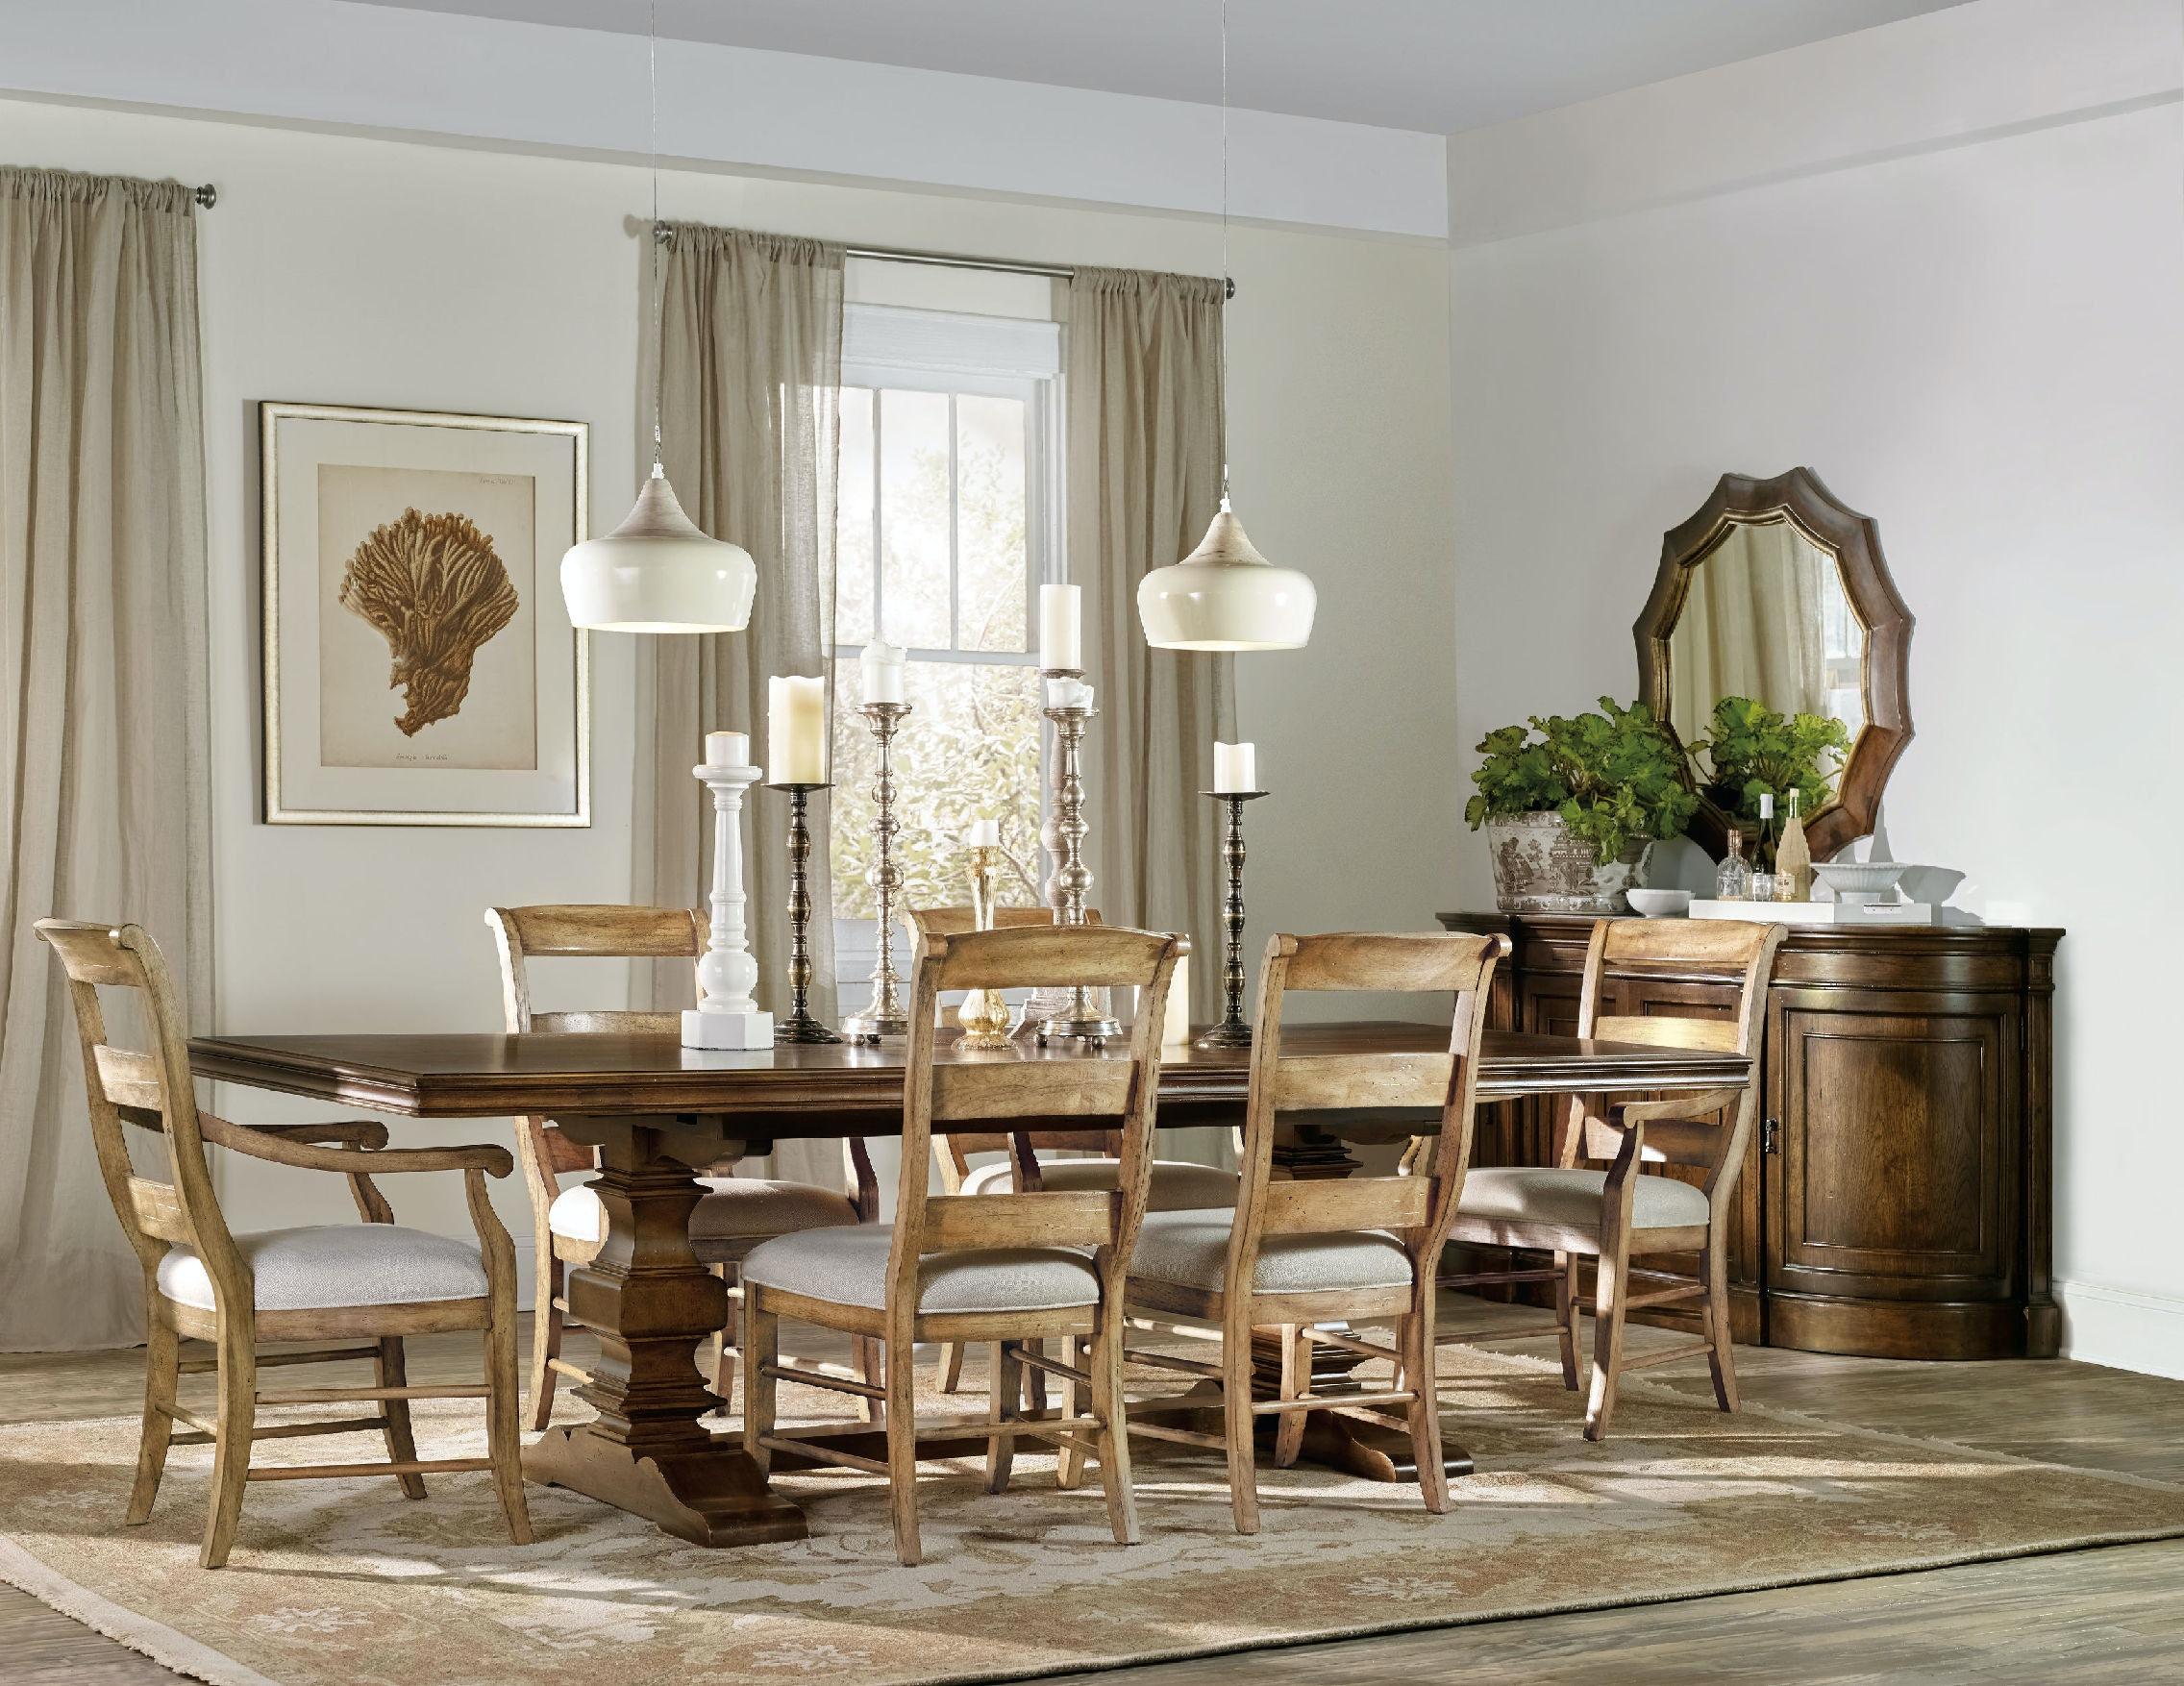 Hooker Furniture Archivist Trestle Table W/2 18in Leaves 5447 75206